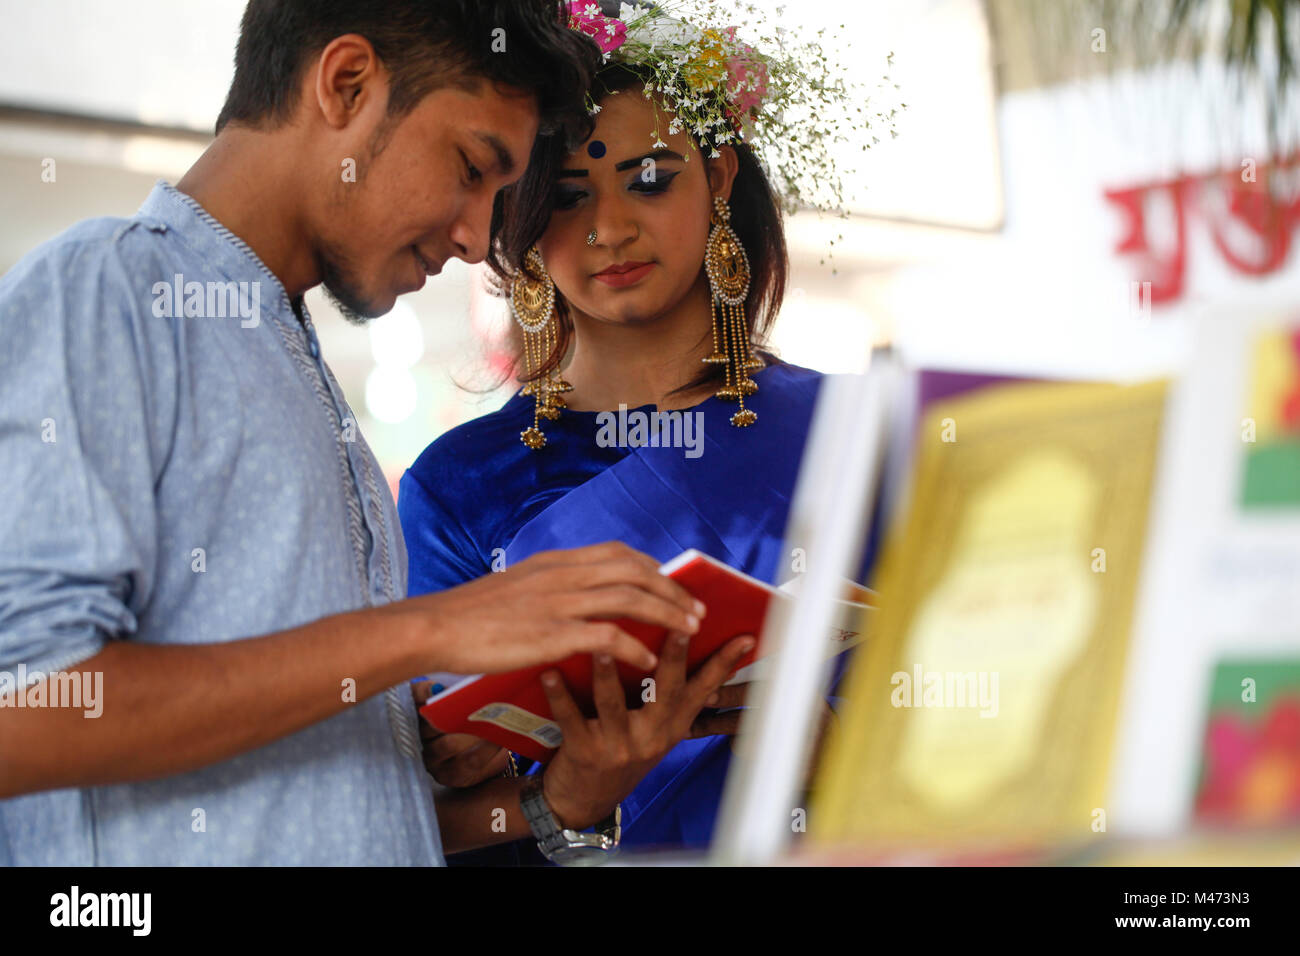 Dhaka, Bangladesch. Februar 14, 2018. Bangladeshi Paar auf der Buchmesse zum Valentinstag in Dhaka am 14. Februar Stockbild